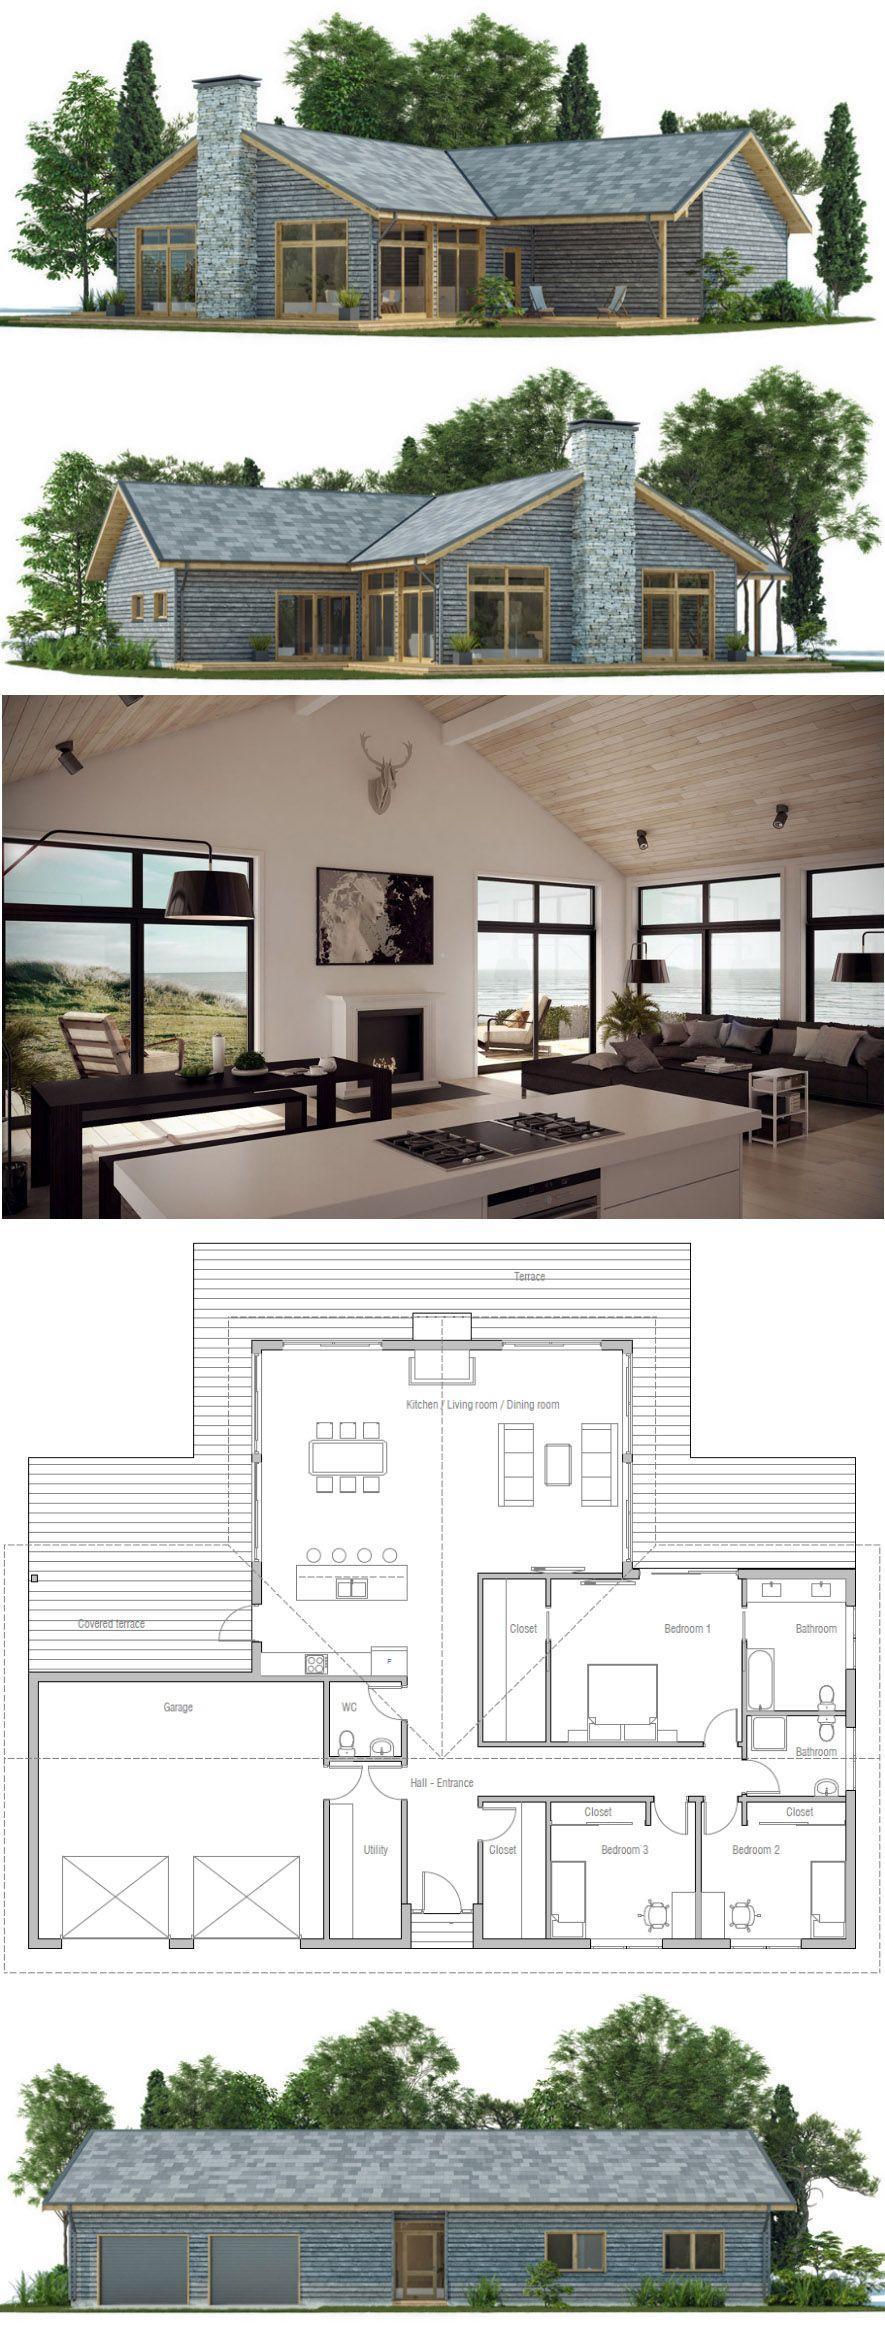 House designs #frontporchideascurbappeal